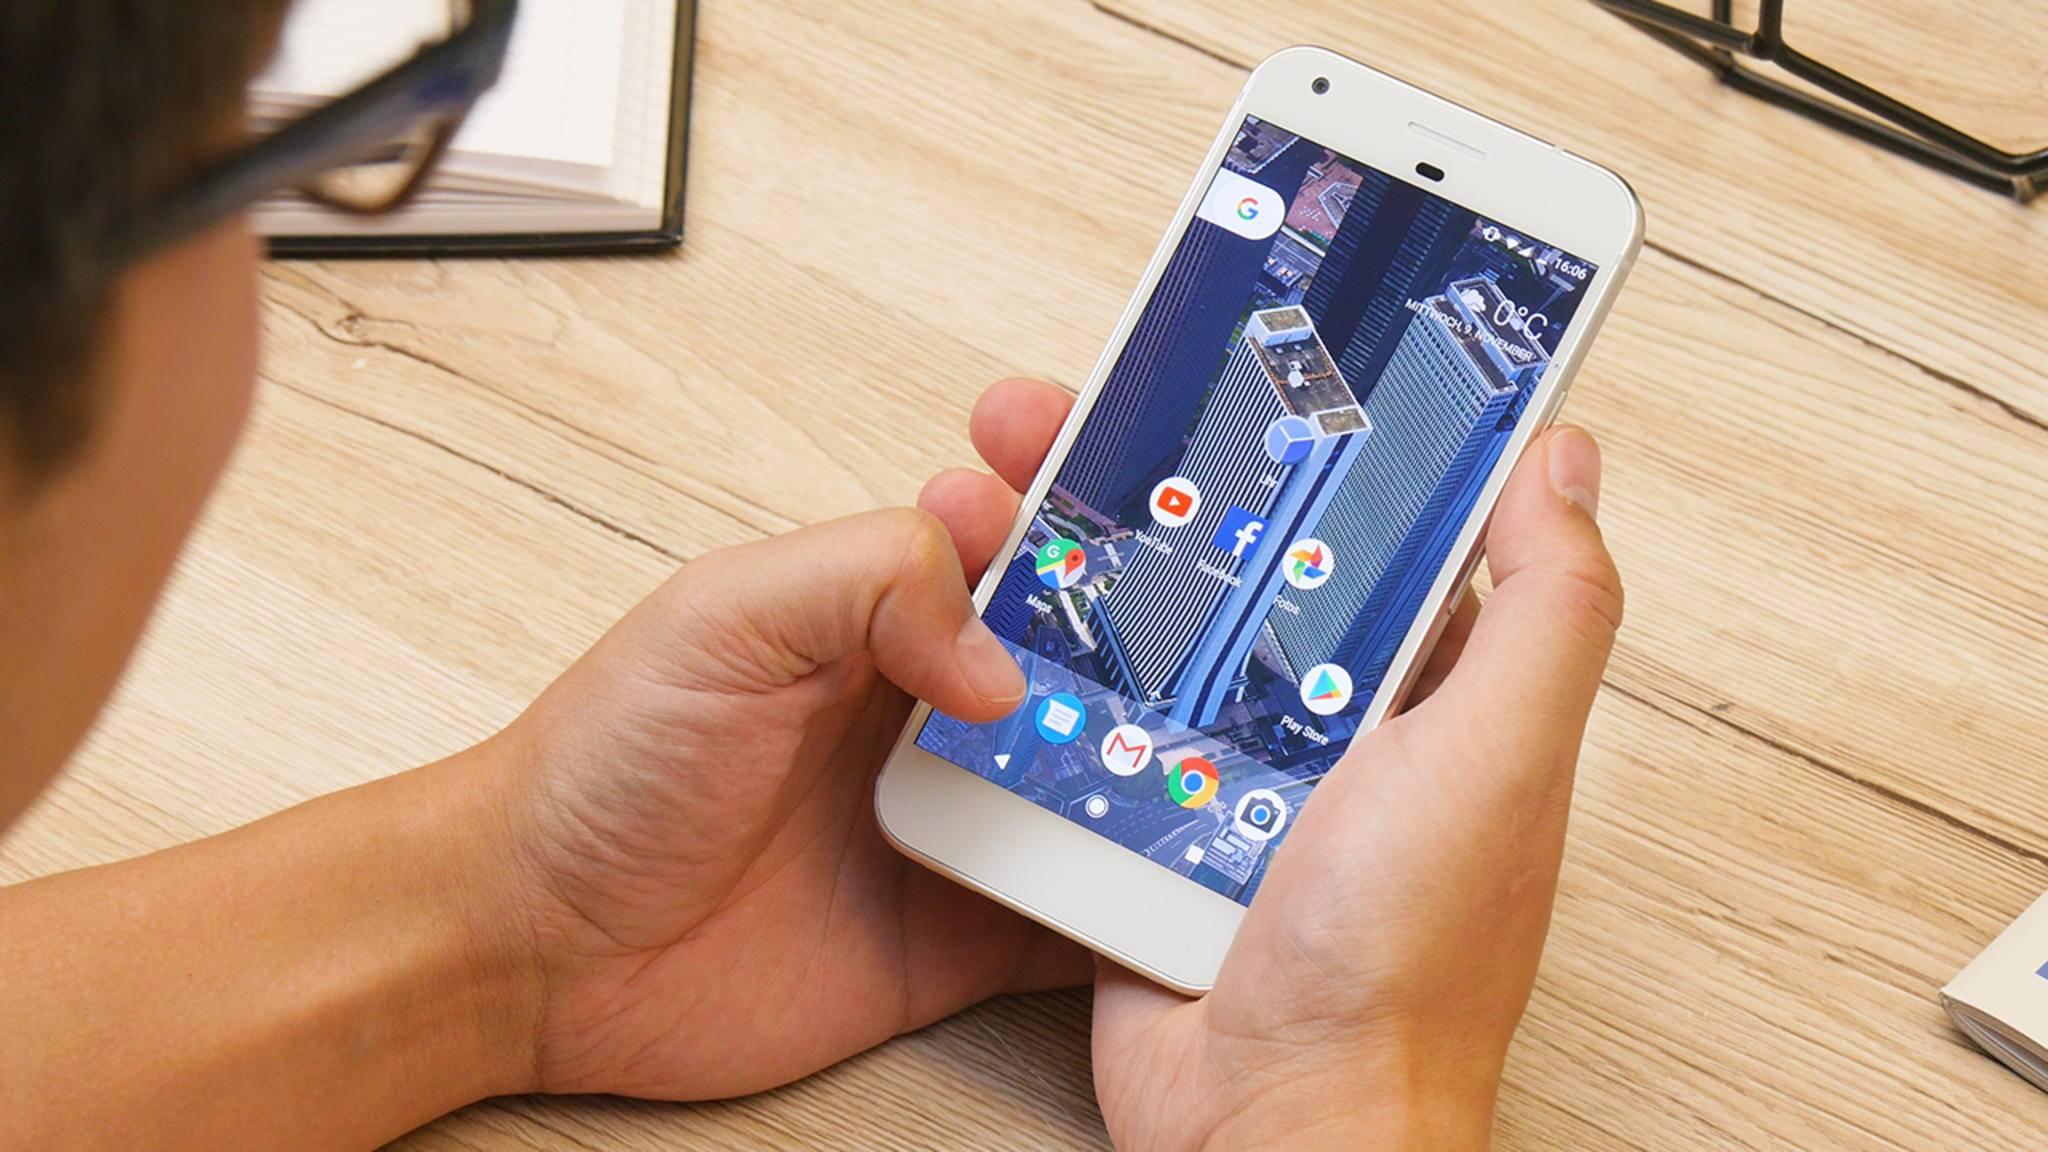 Das Google Pixel bekommt zwei neue Features per Software-Update spendiert.